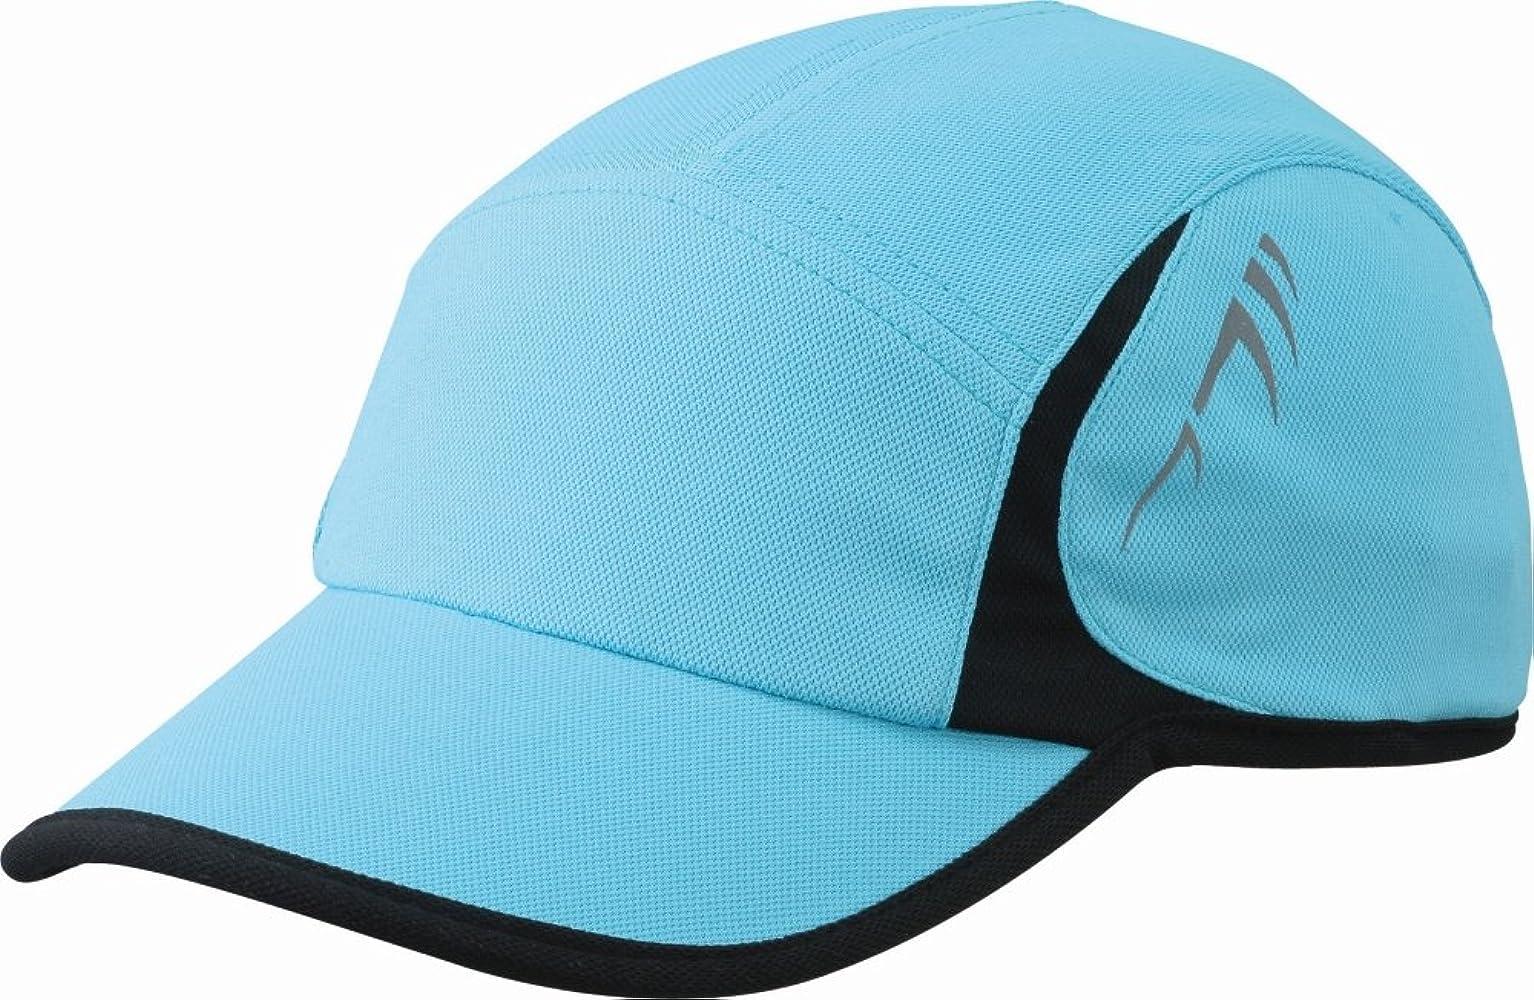 Myrtle Beach Gorra de Béisbol - para Hombre Turquoise/Black Talla ...